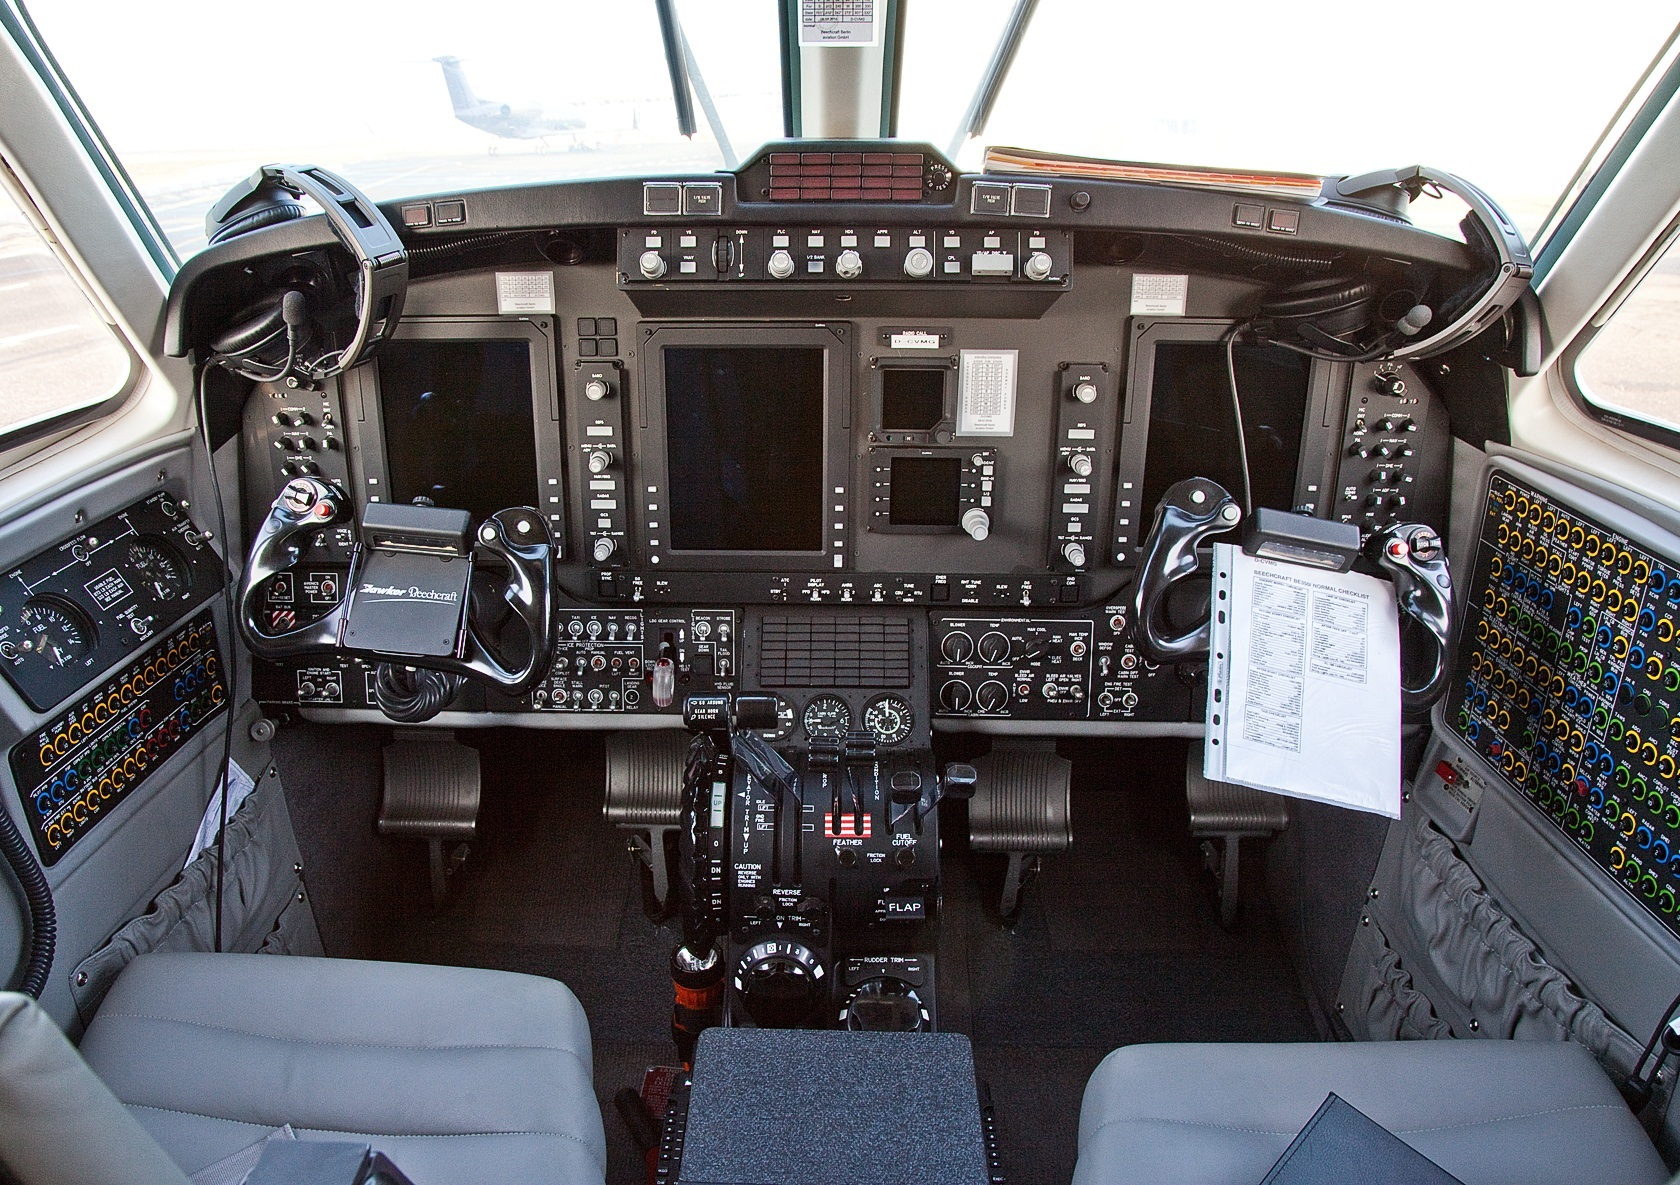 King Air 350i panel